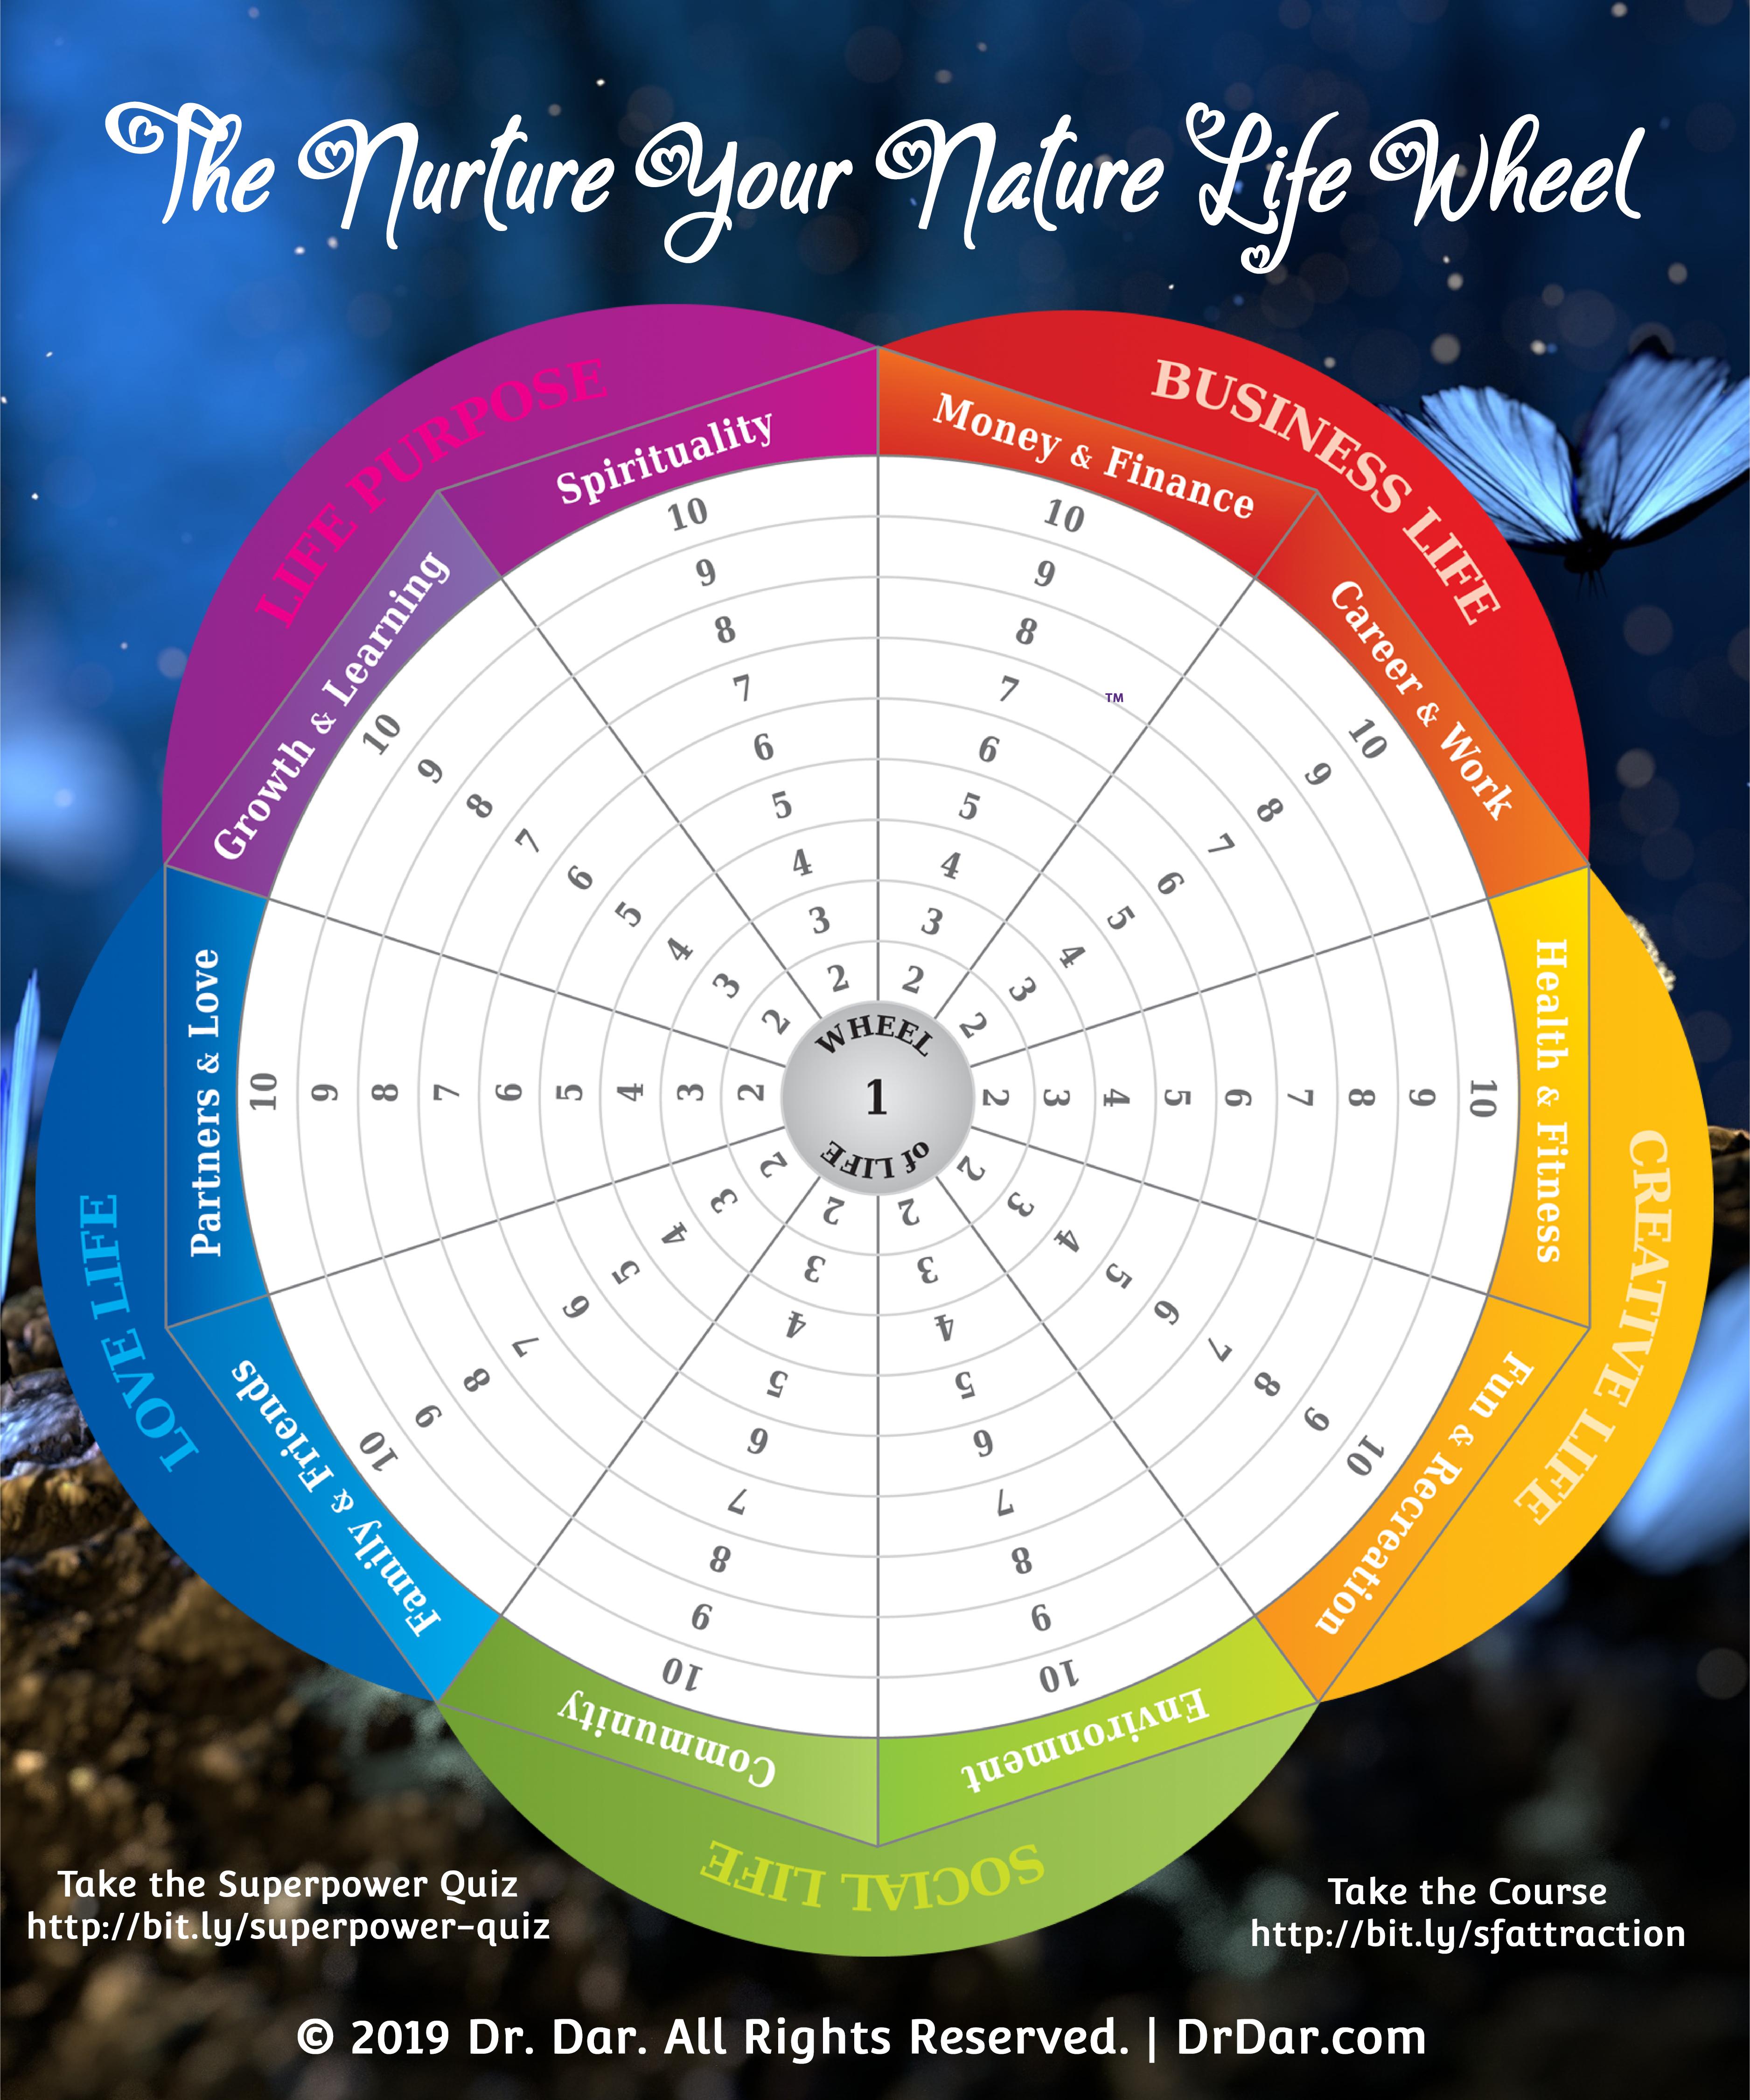 The Nurture Your Nature Life Wheel 00007